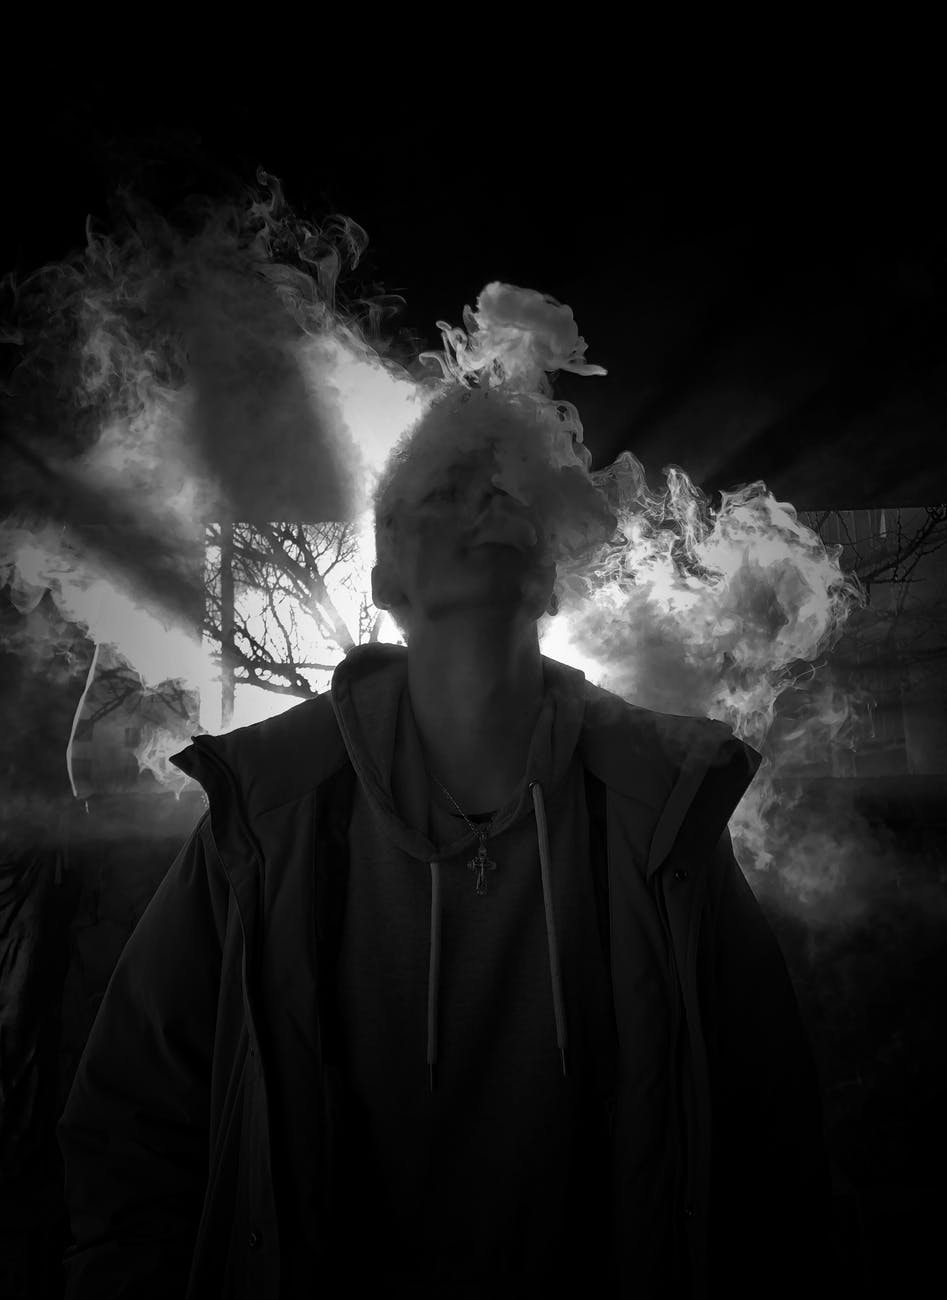 Oppressive haunting, The Horla, Captivated Chat: Super stories!